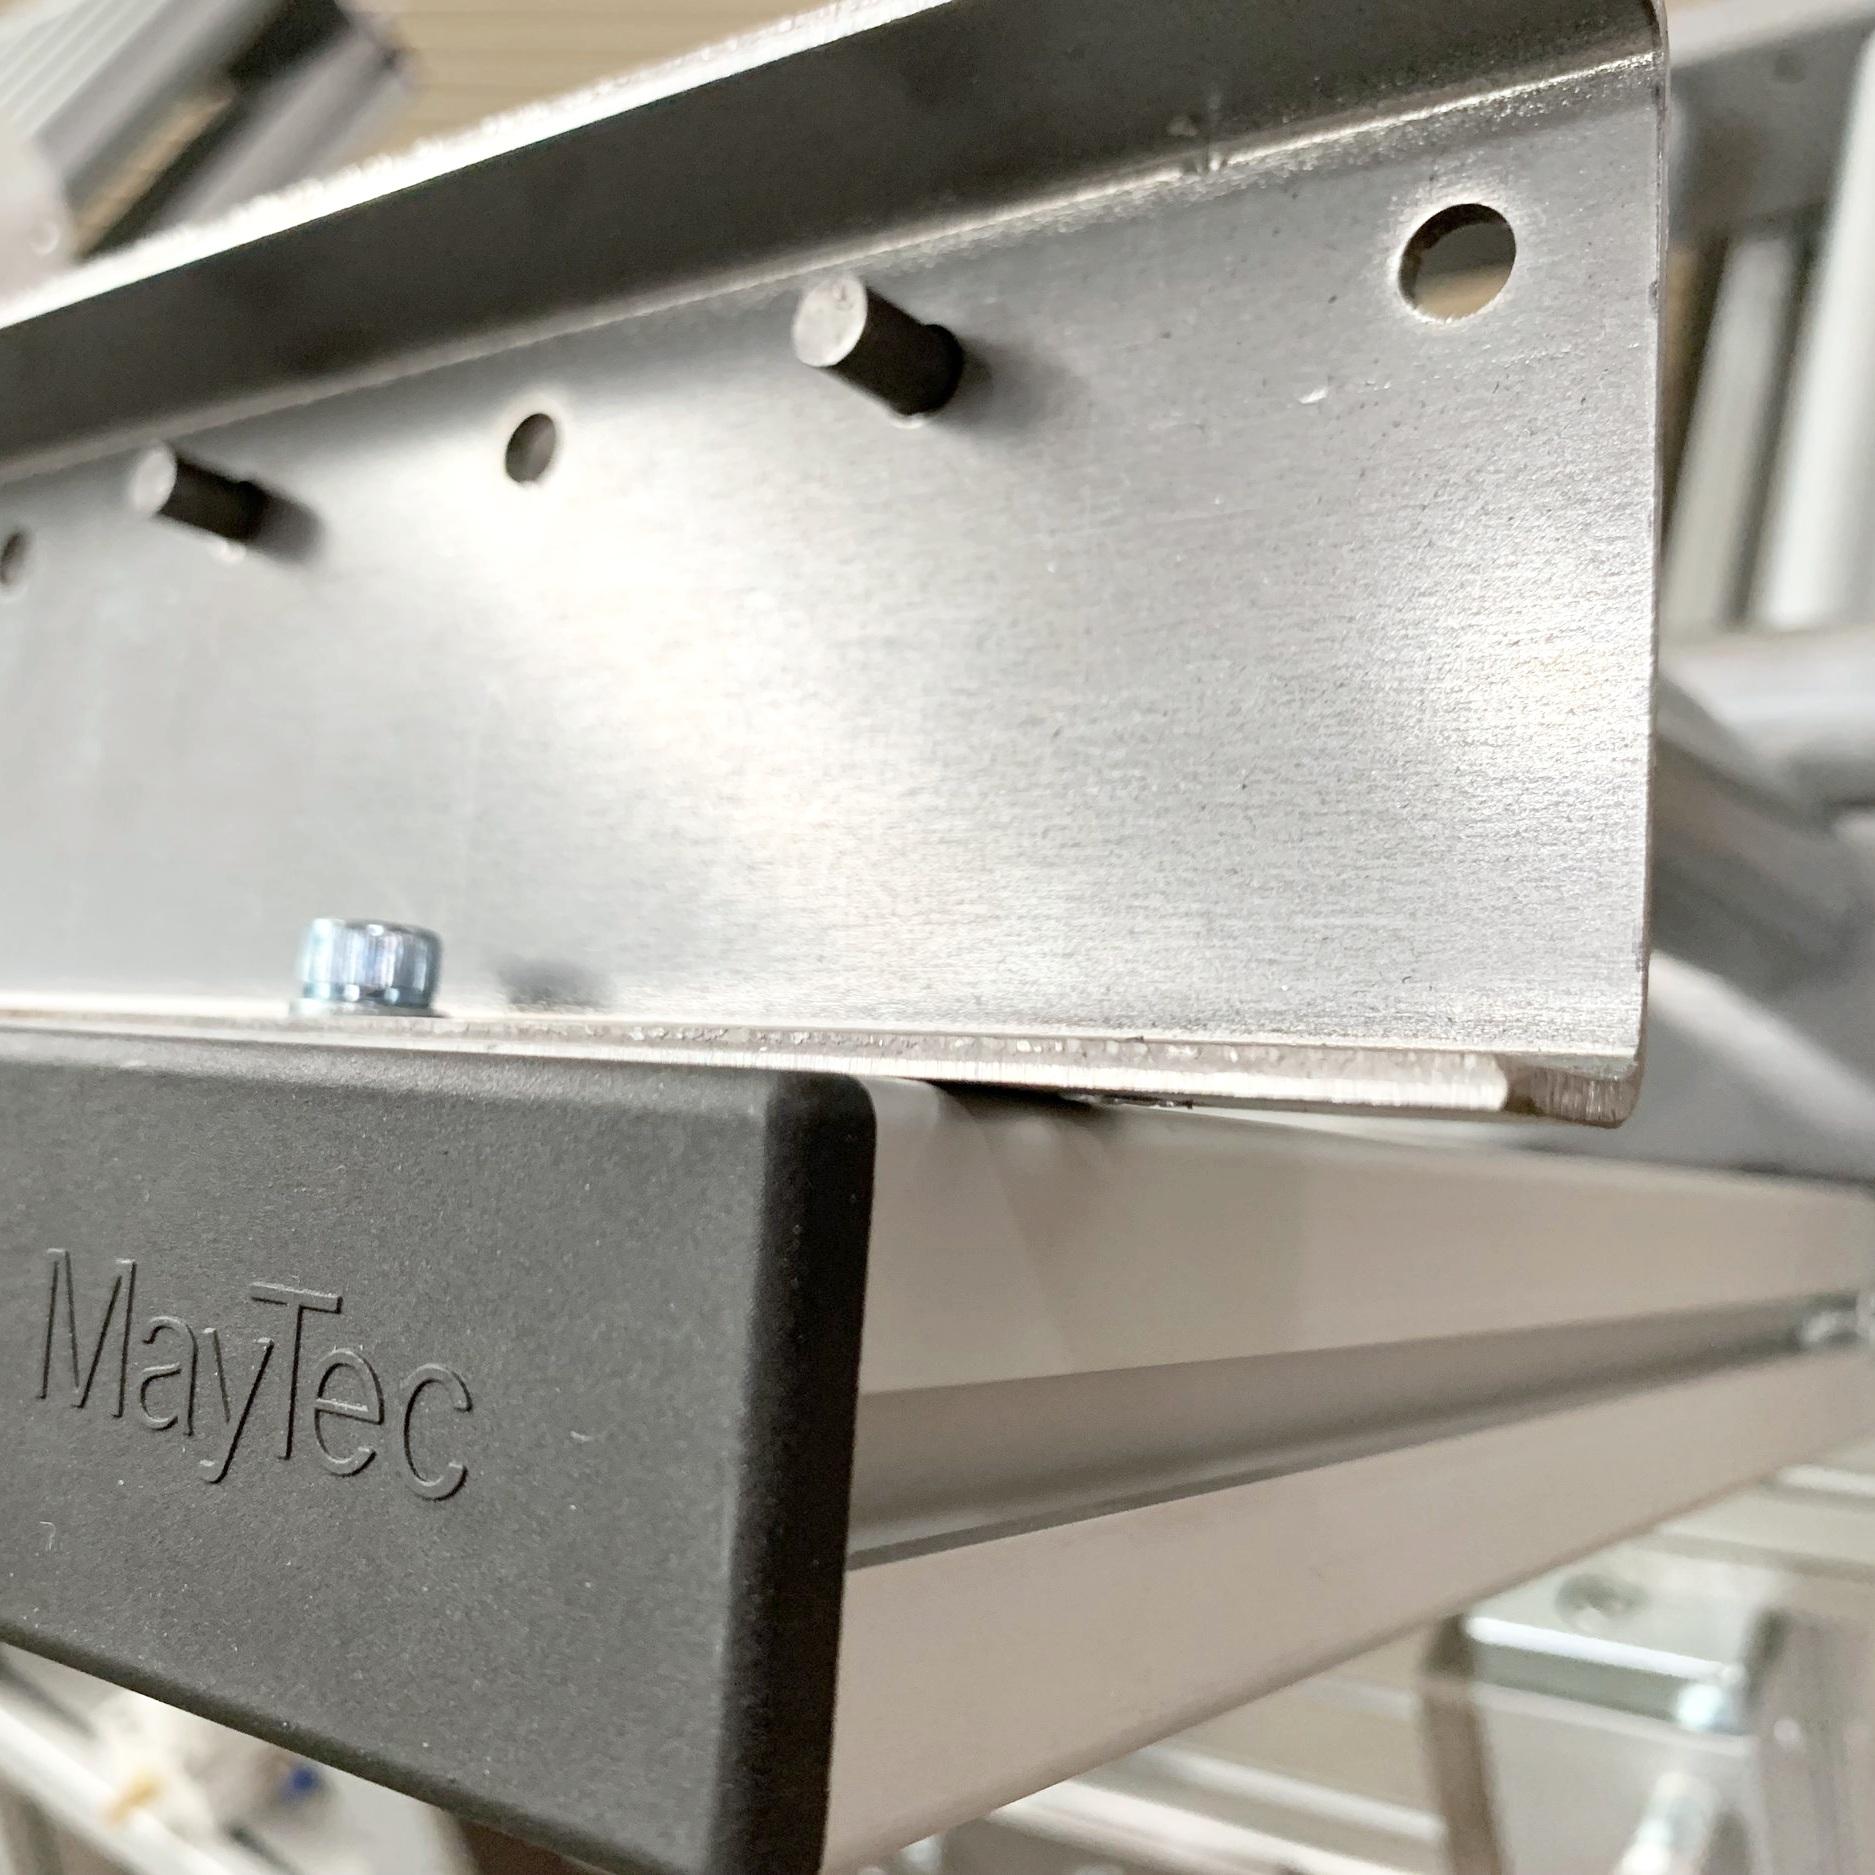 MayTec-endcap_Fitz-Thors-Engineering_MayTec-Distributor_Birmingham-AL.jpeg